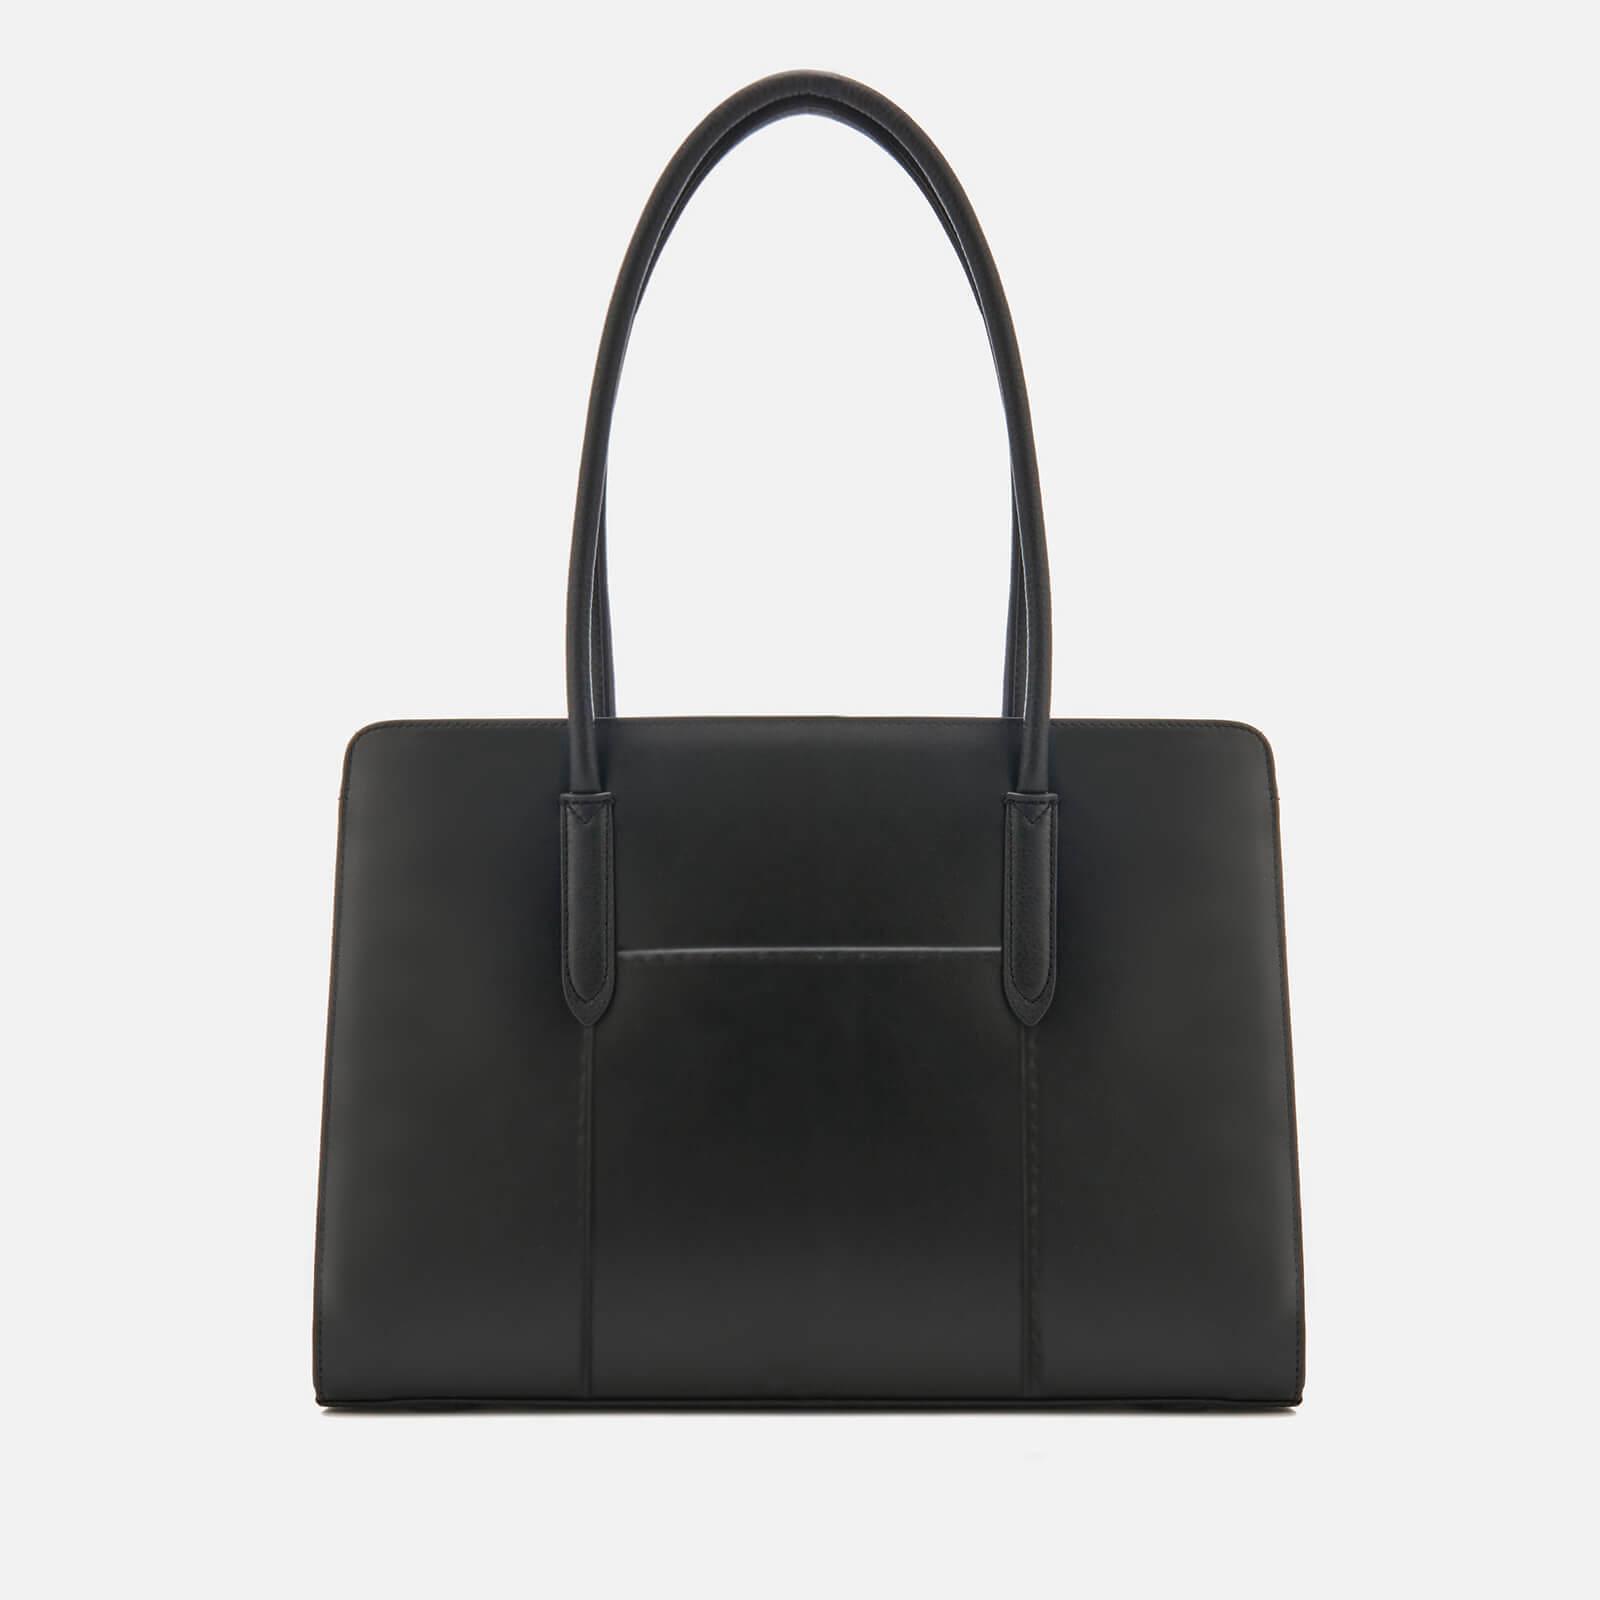 8d2a49e4a3e1 Radley Liverpool Street Stud Large Workbag Tote Bag in Black - Lyst